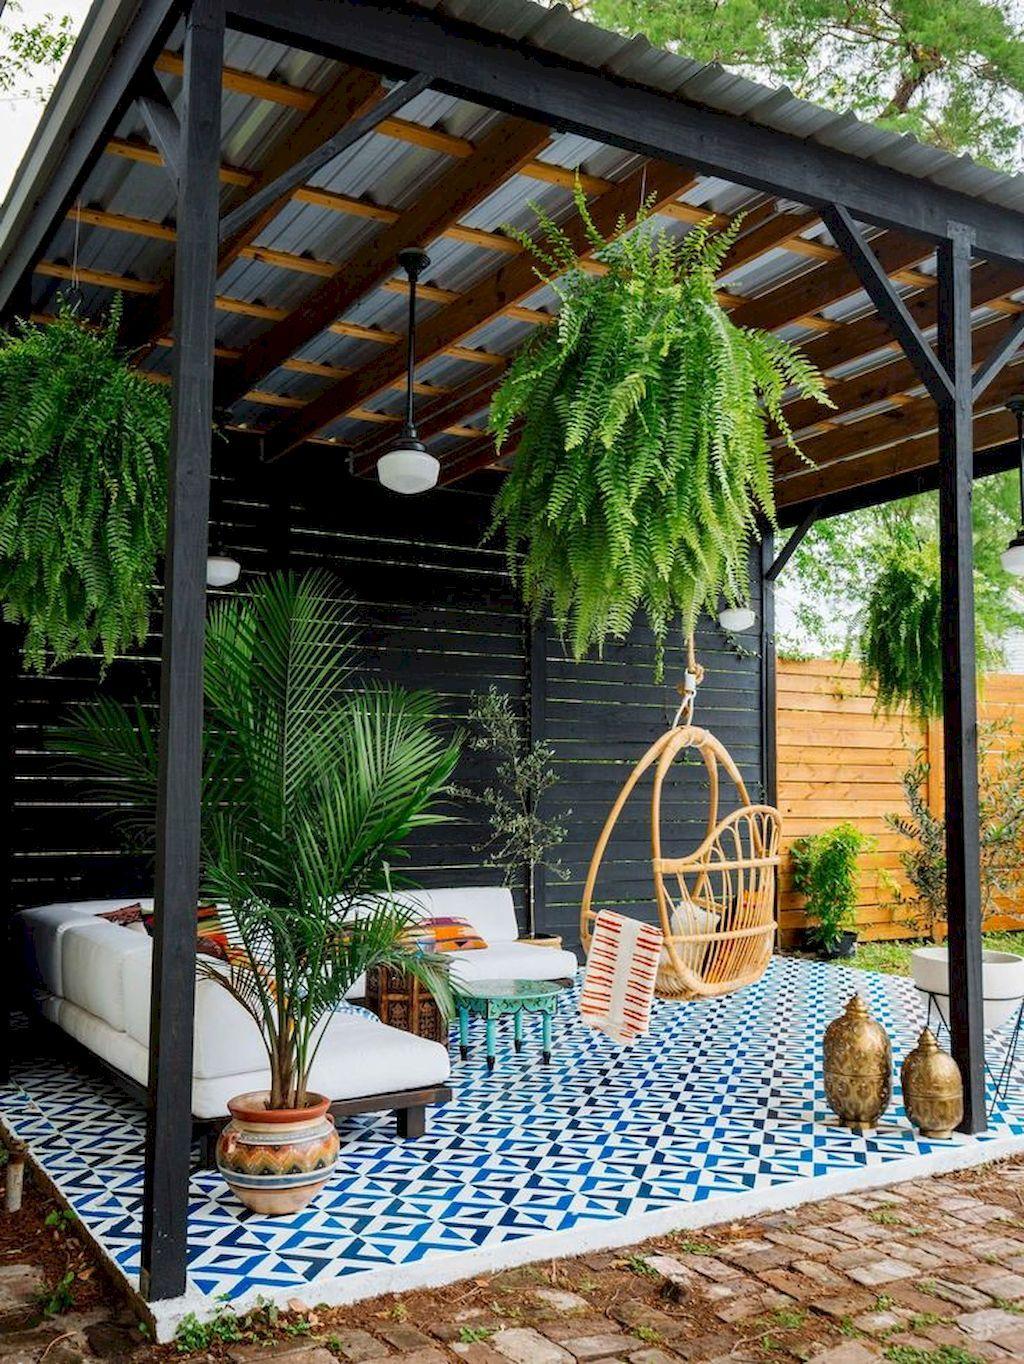 60 Fresh Backyard Landscaping Design Ideas on A Budget | Lost garden ...